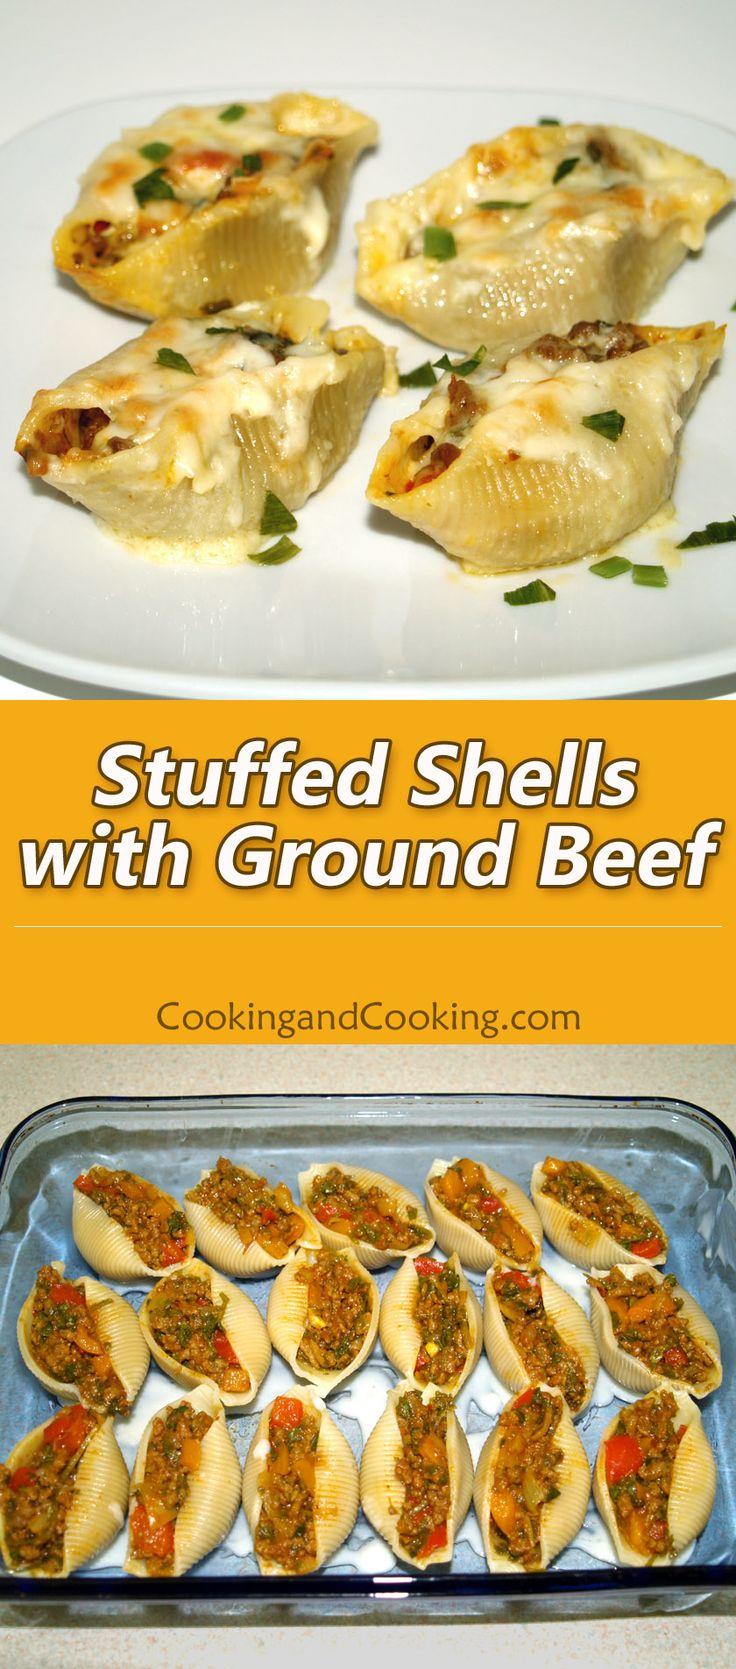 Stuffed Shells with Ground Beef Recipe